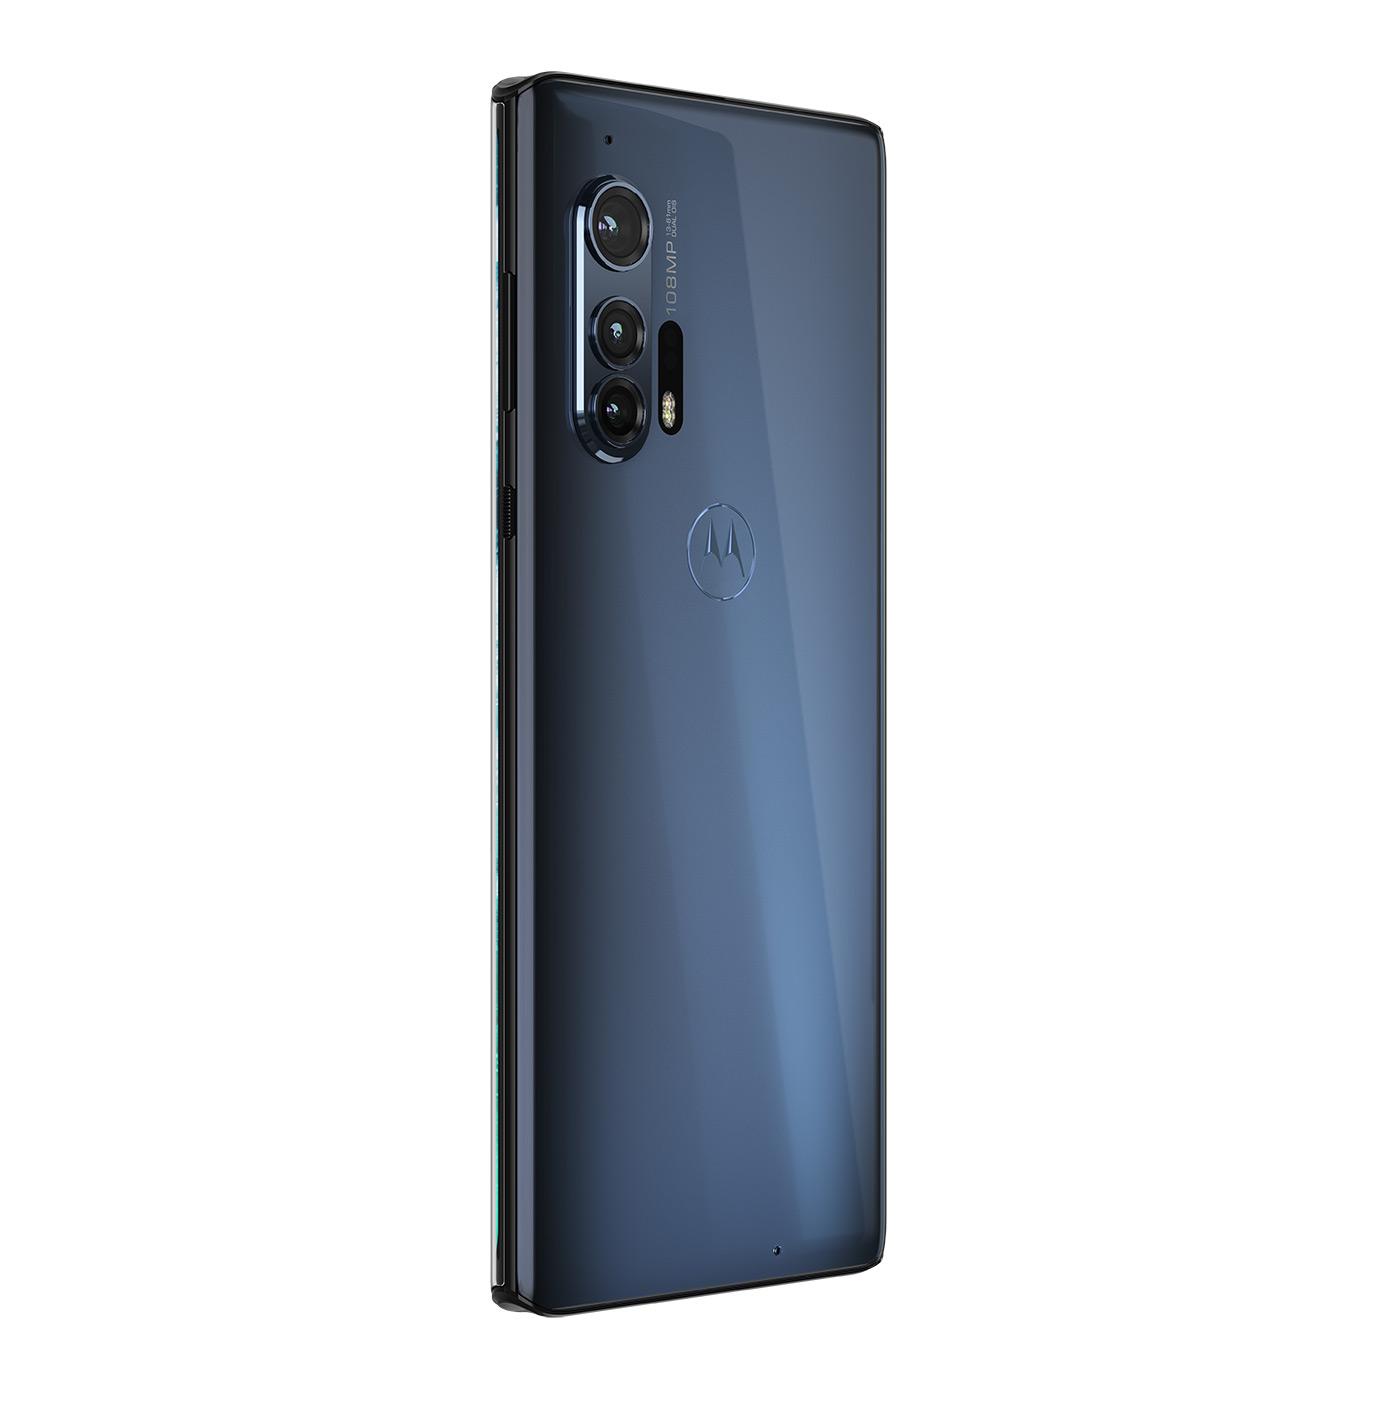 Новый флагман Motorola: motorola edge+